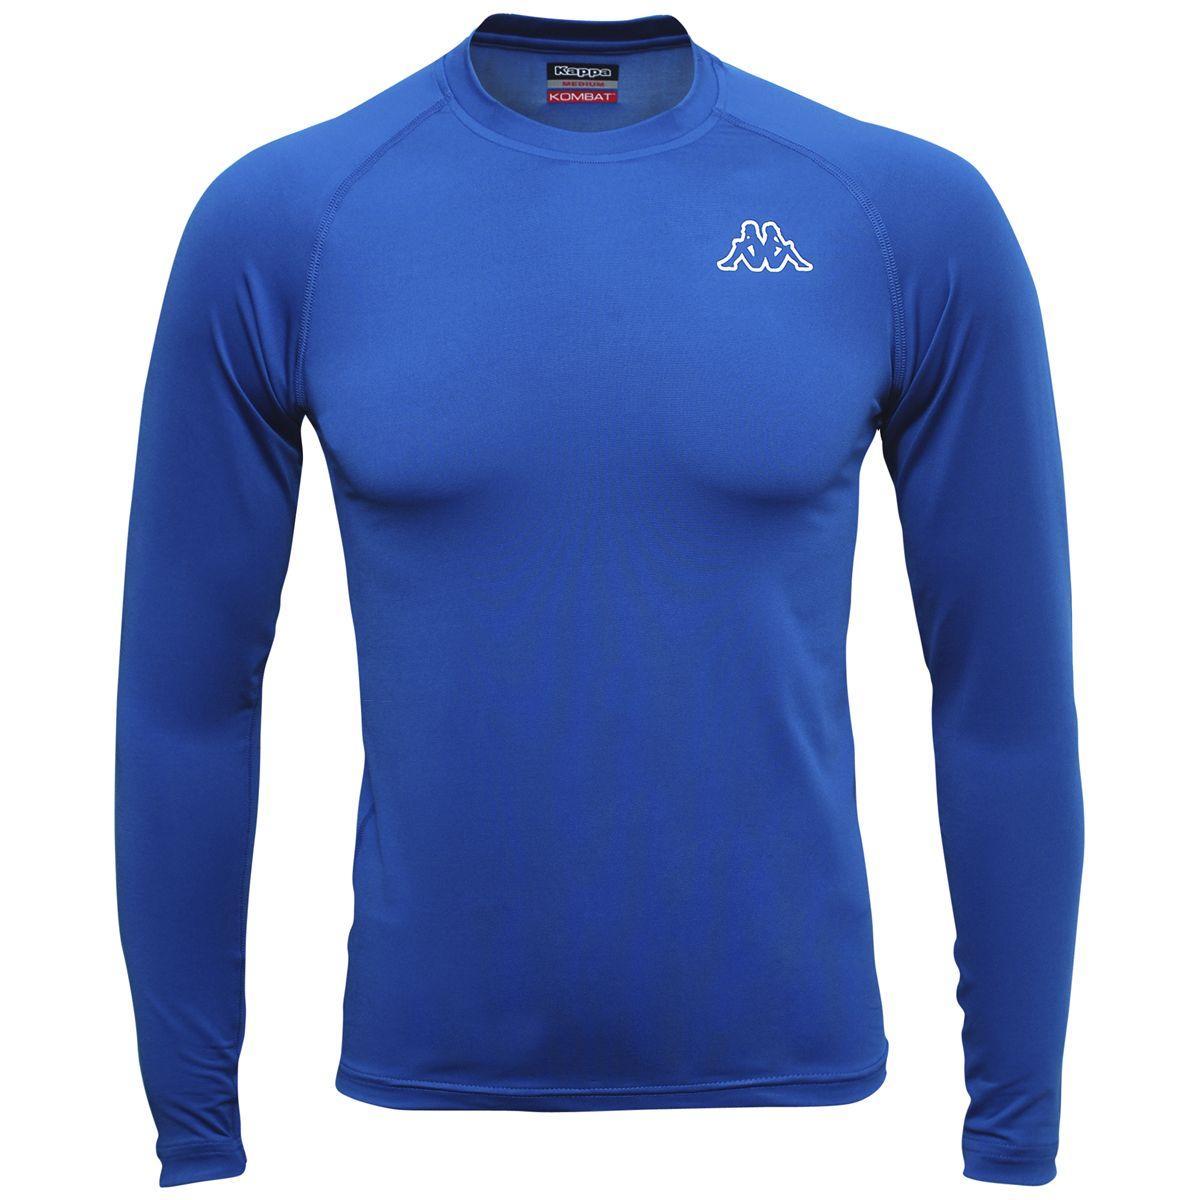 Kappa T-Shirt SKIN T-SHIRTS & TOP Functional Man